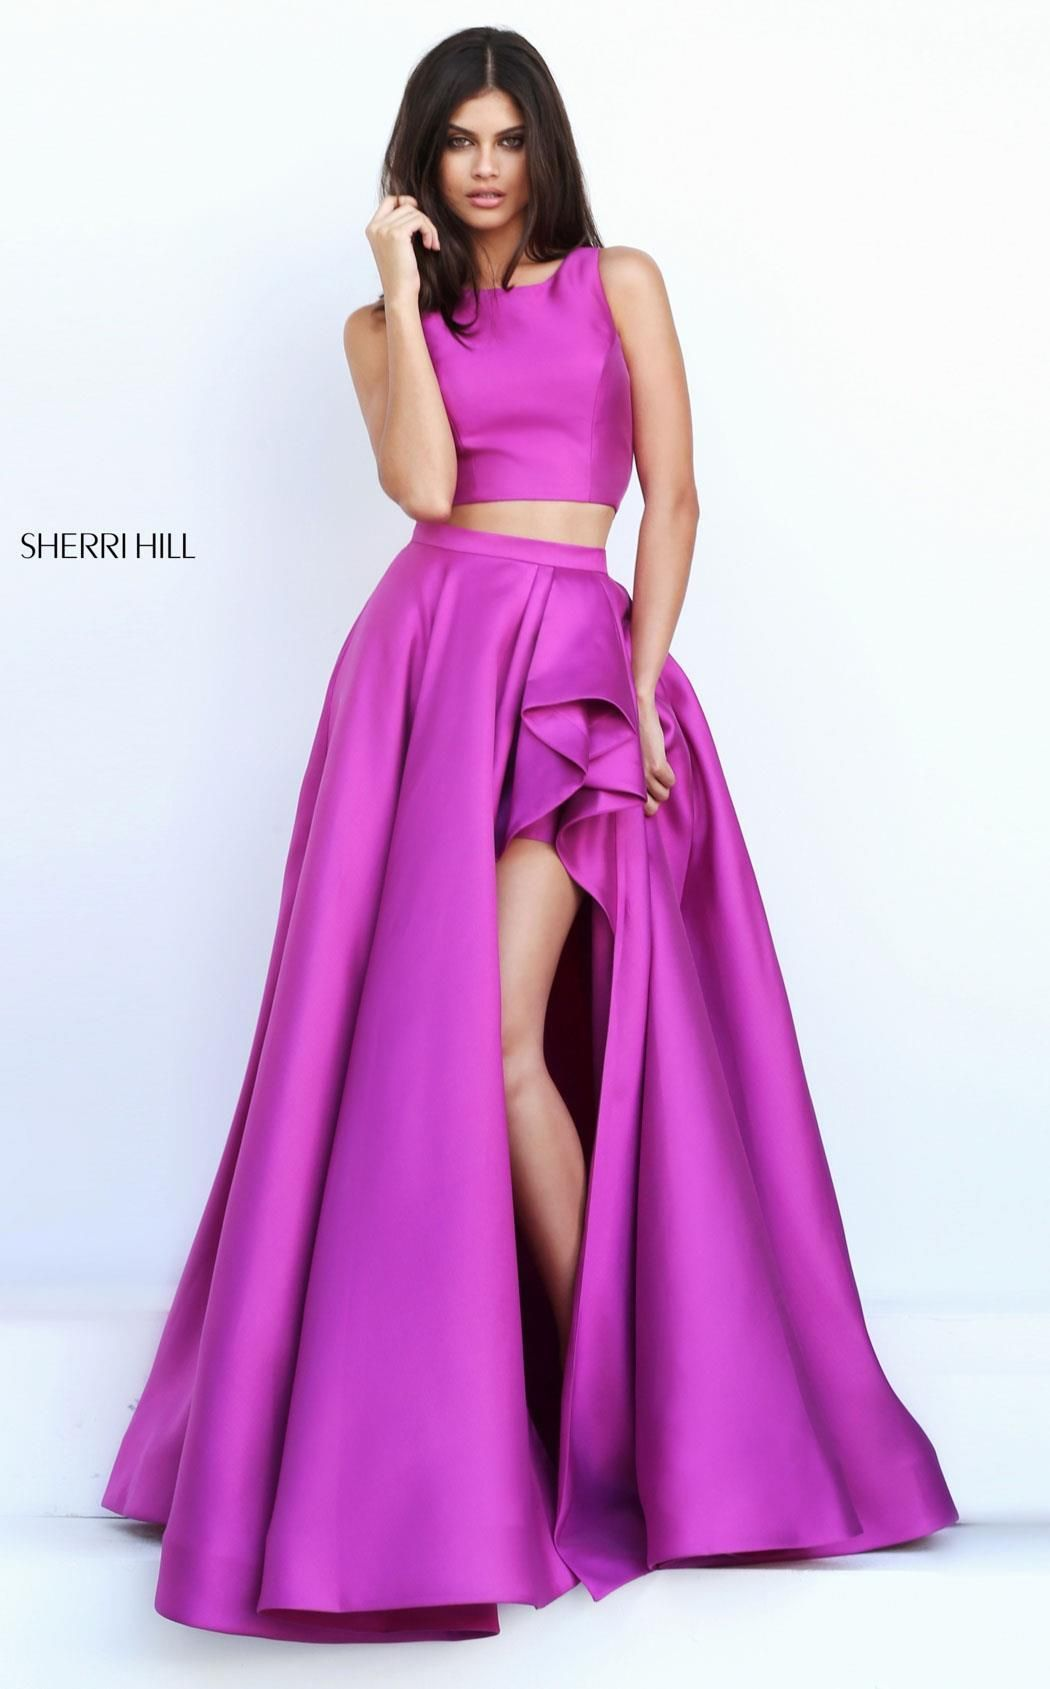 Sherri hill in to sew pinterest prom dresses